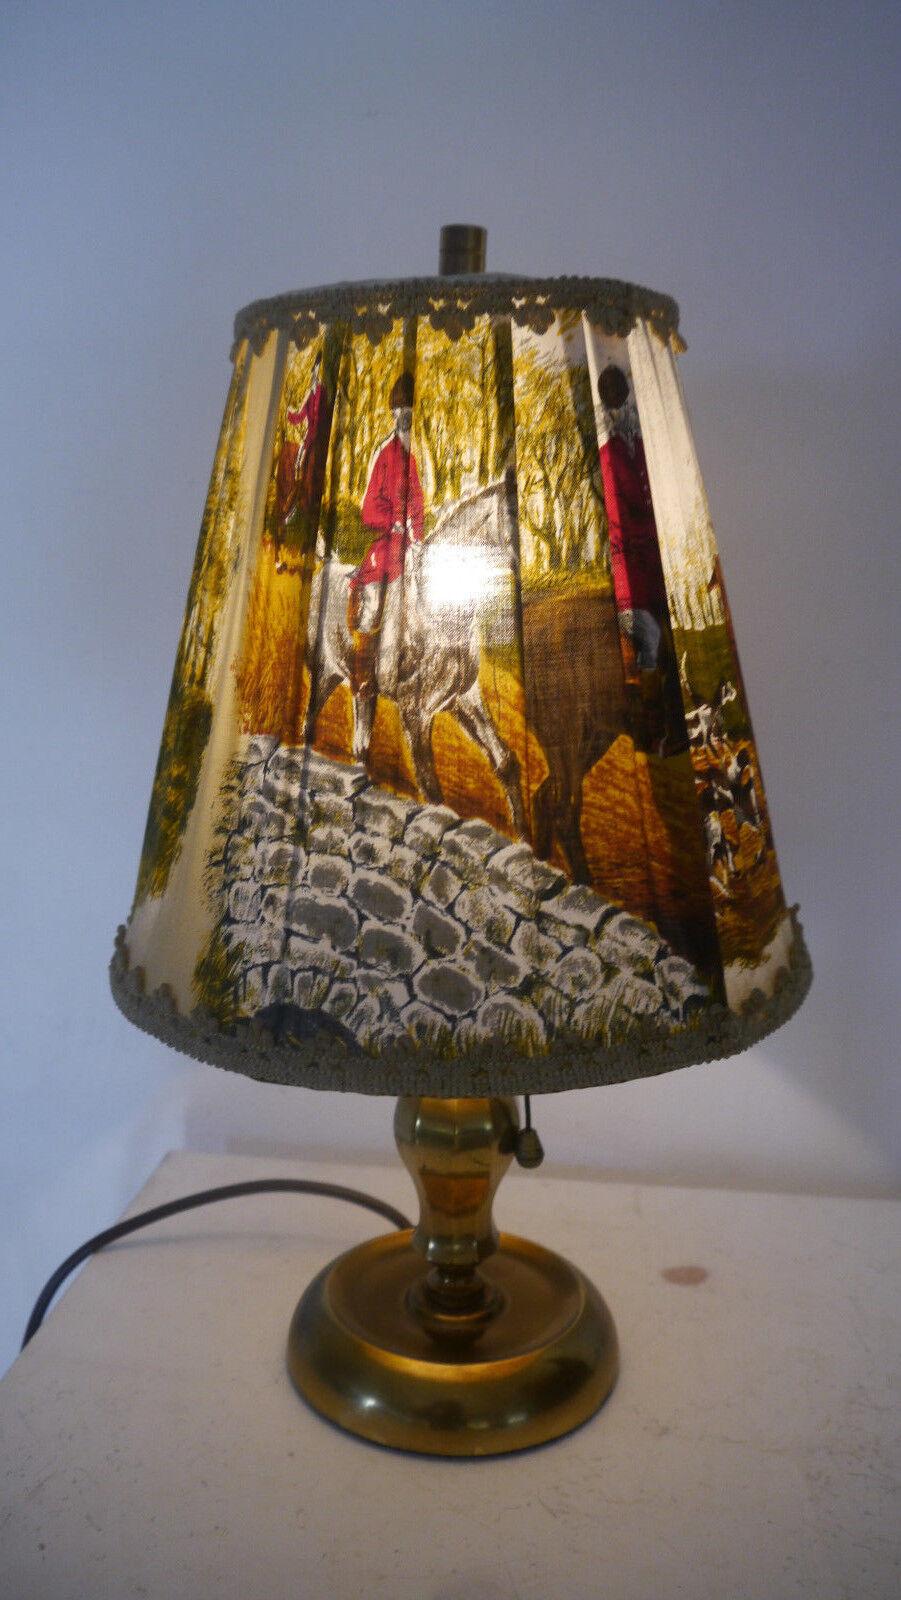 Tischlampe Messing mit Jagdmotiv Lampenschirm - Bakelit Lampenfassung